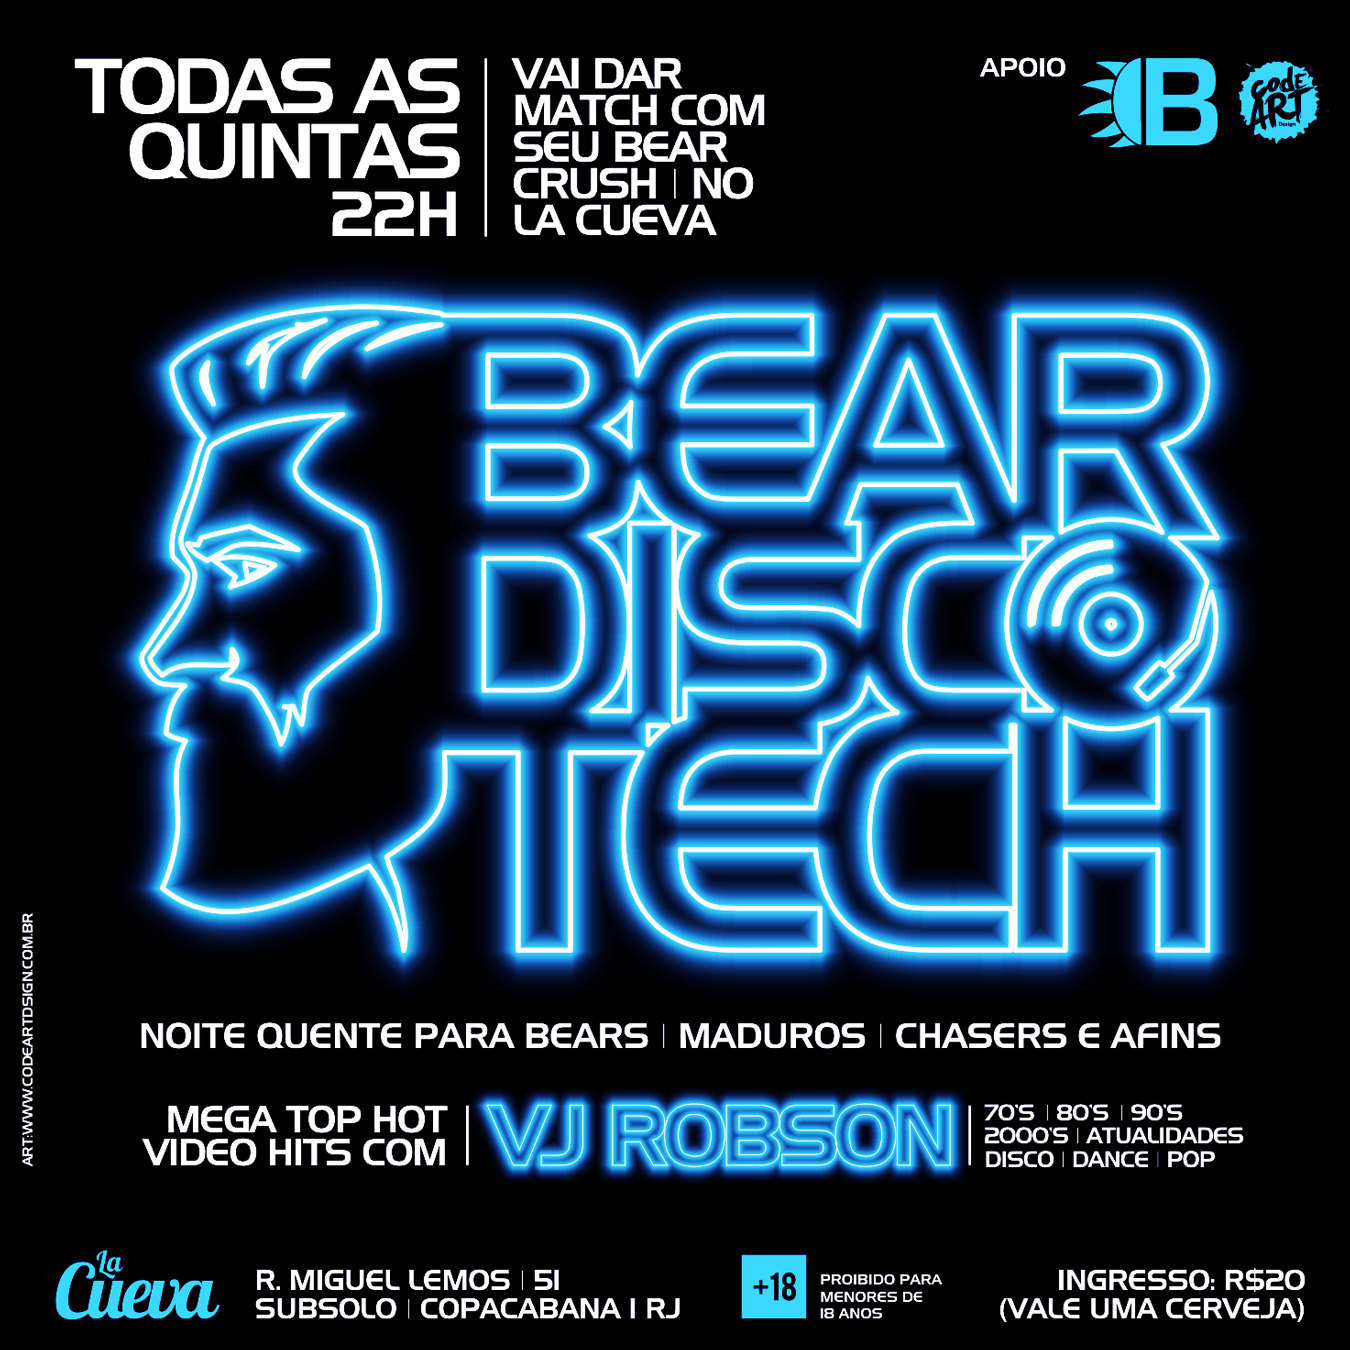 QUINTA-FEIRA - 22H - bear discotech